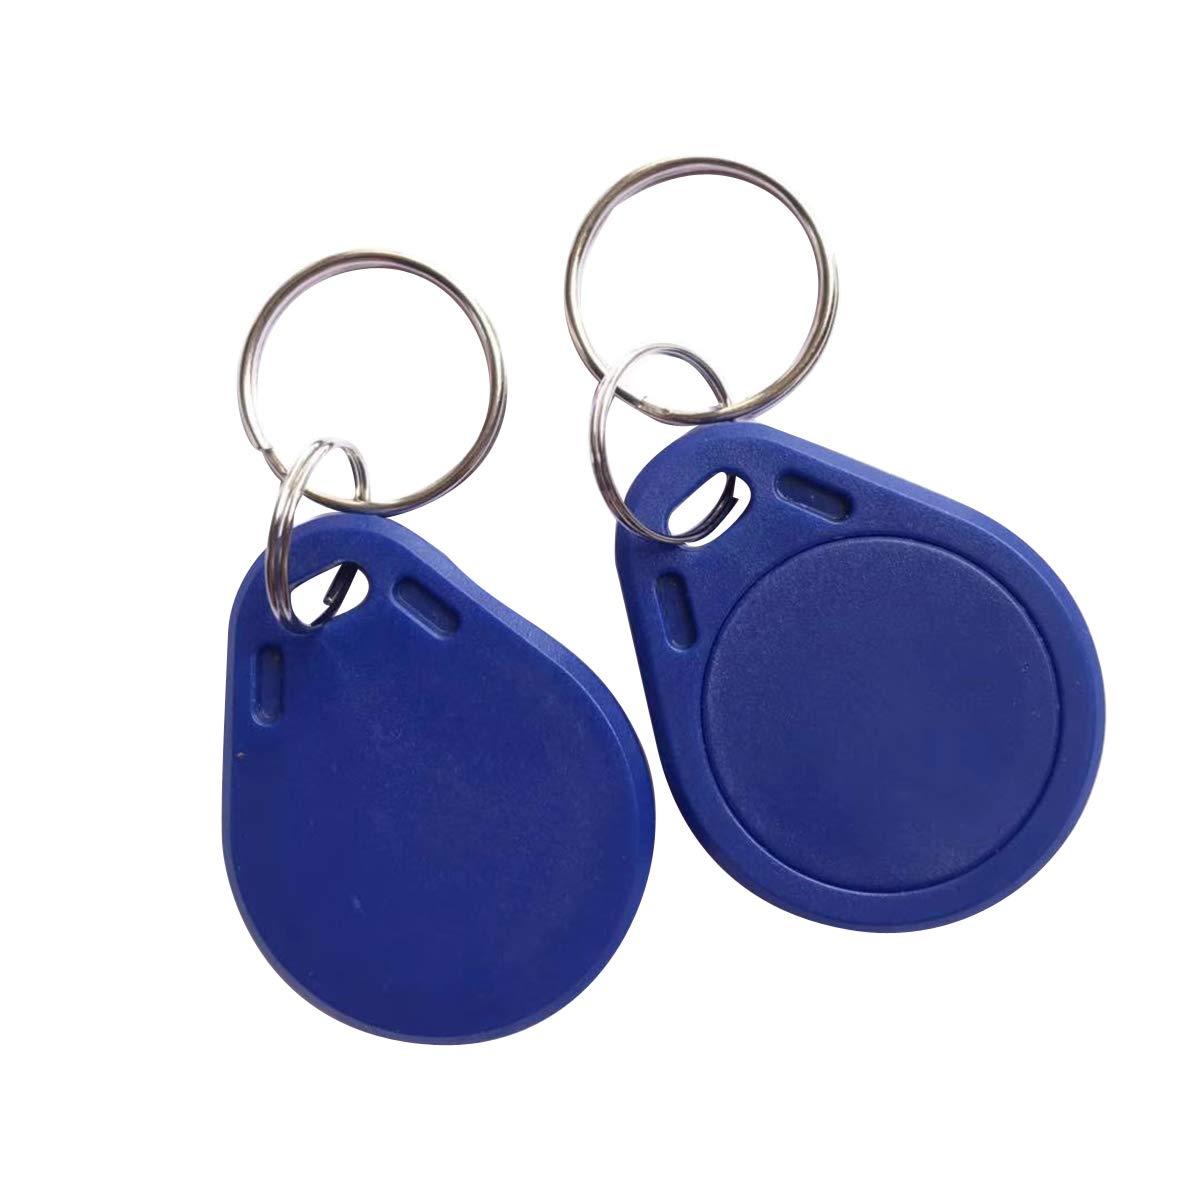 YARONGTECH MIFARE Classic® 1K etiqueta RFID ISO14443A Llaveros 13,56mhz ABS IC NFC Etiquetas para control de acceso (Pack de 100)